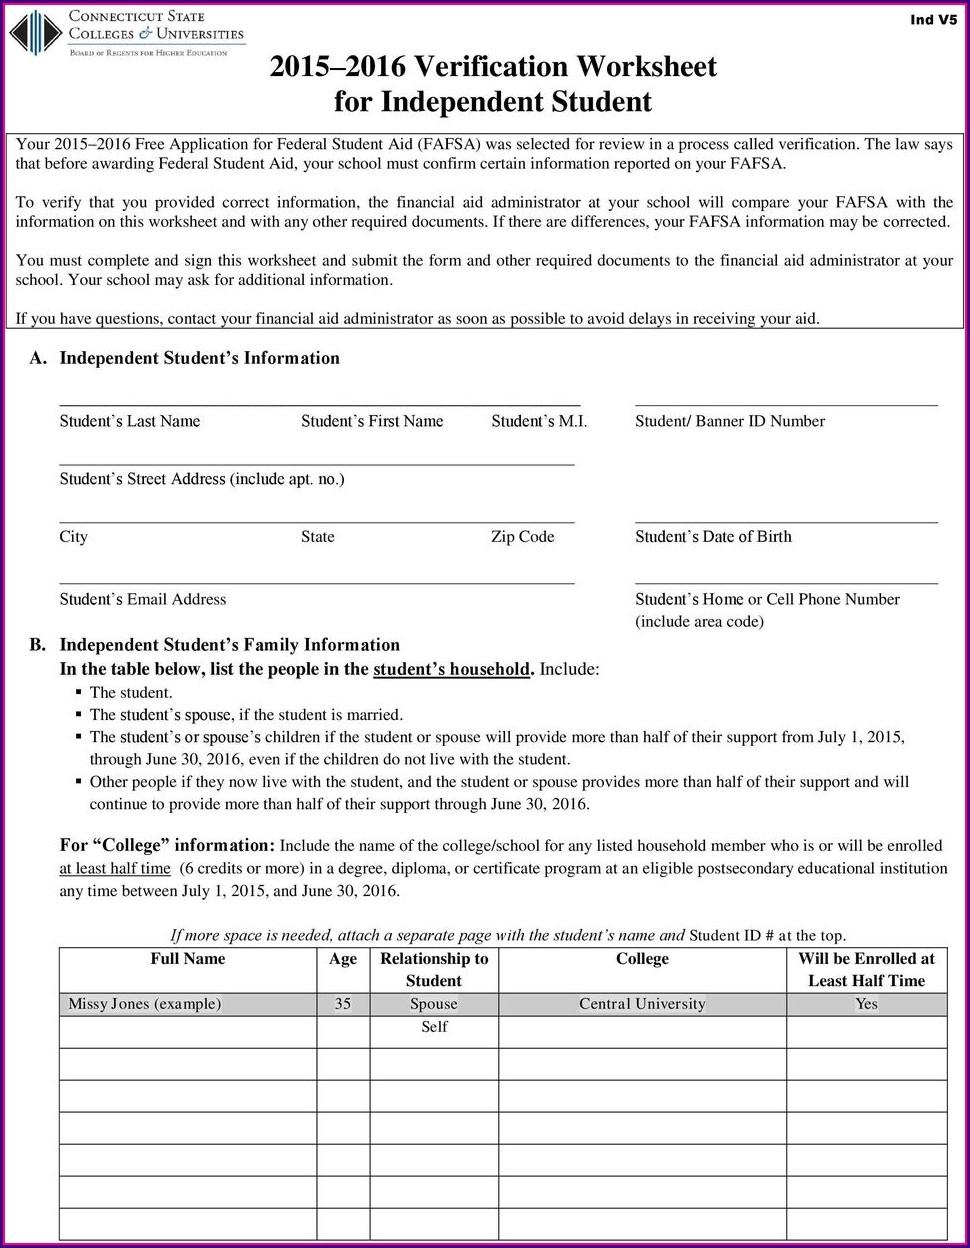 Fafsa Verification Worksheet For Independent Students